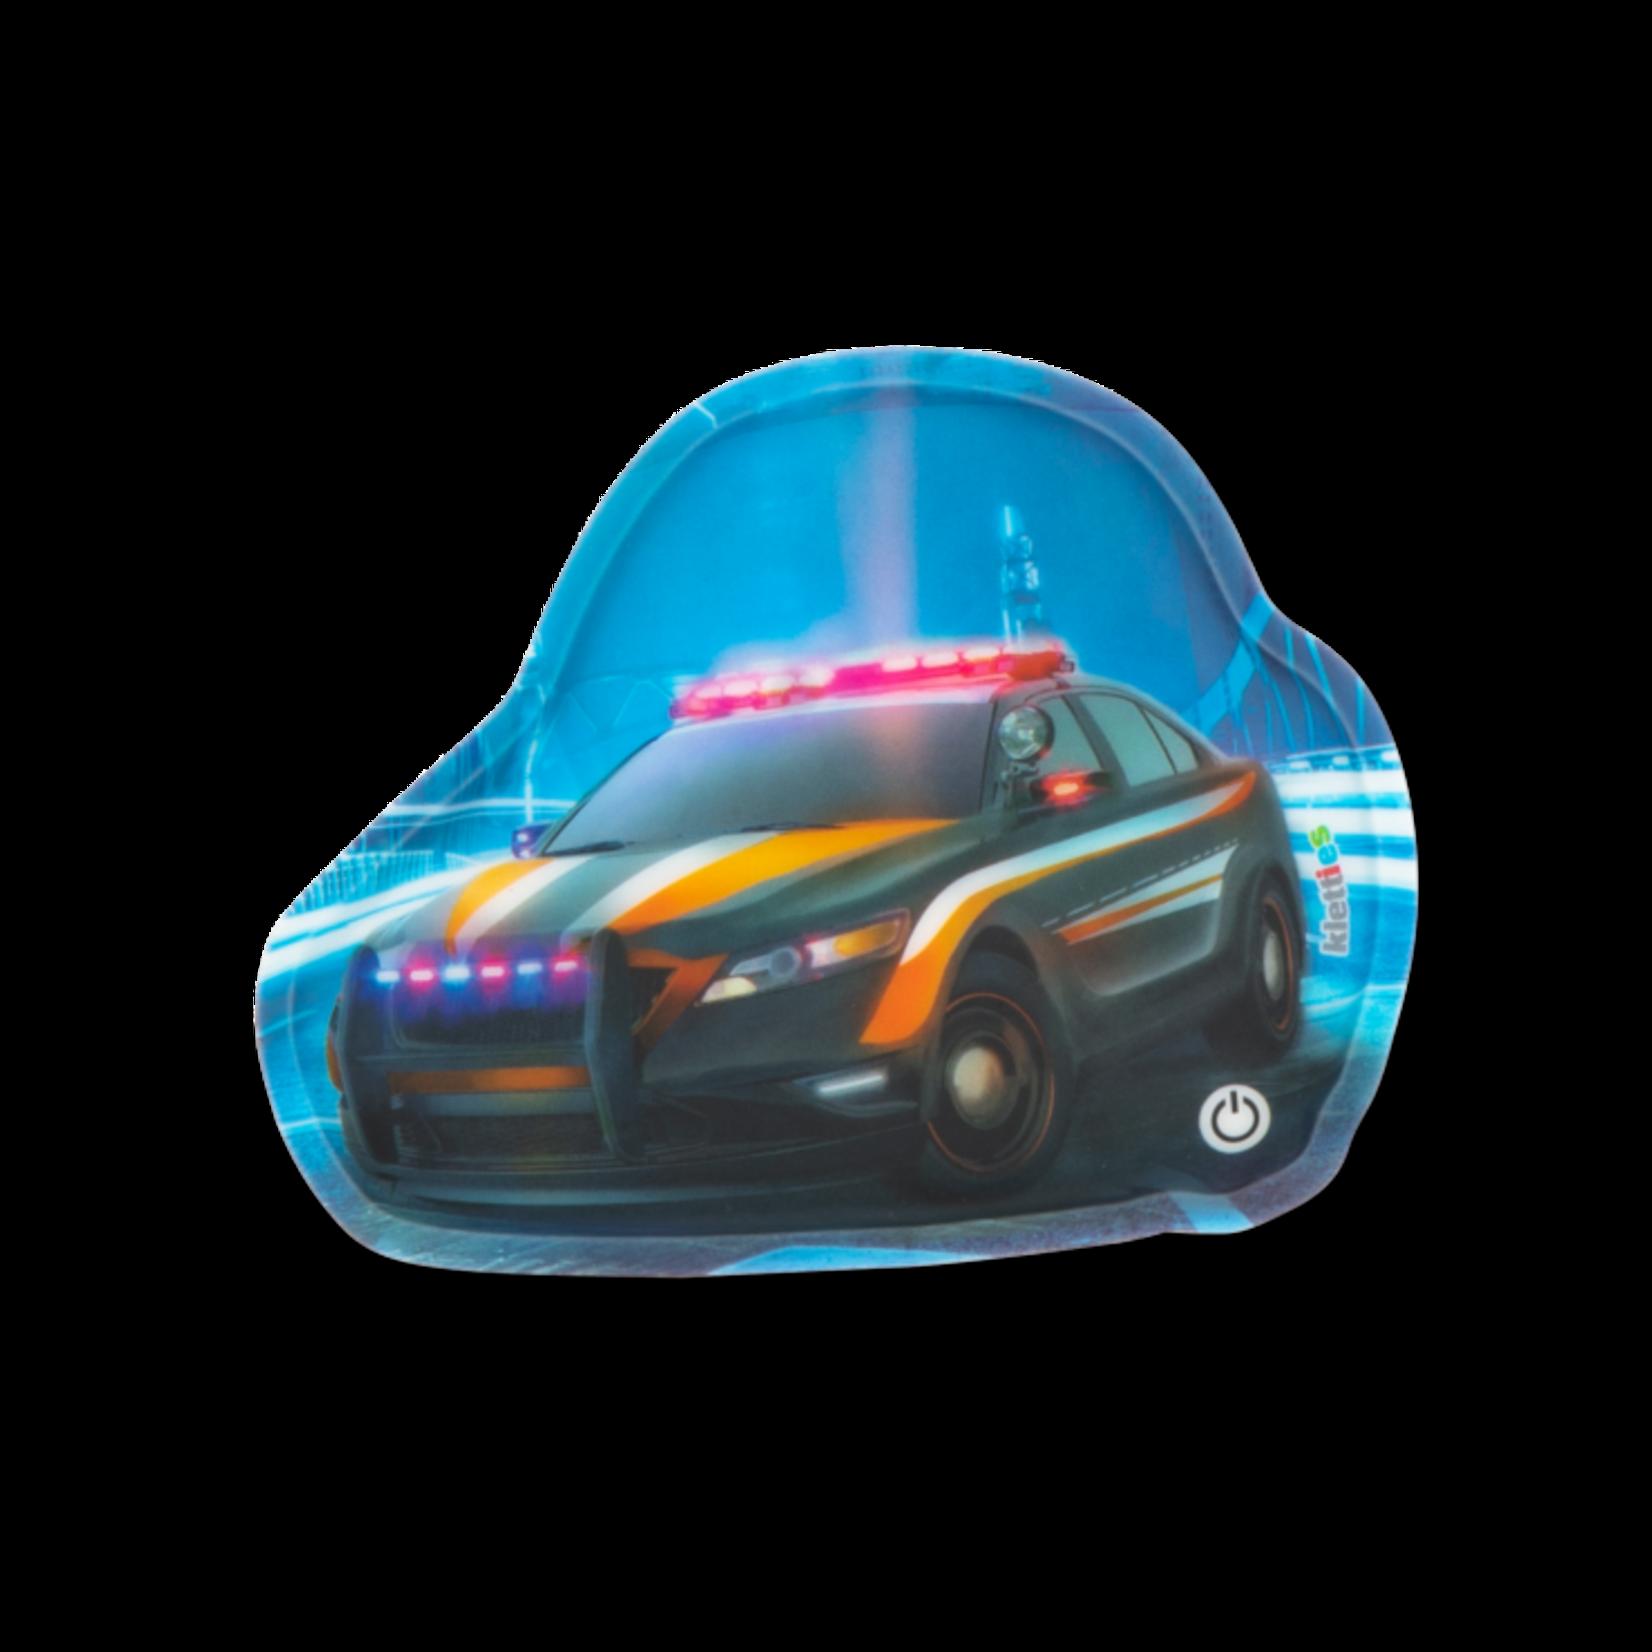 ERGOBAG ERGOBAG BLINKIE KLETTIE 1tlg Polizeiauto 20